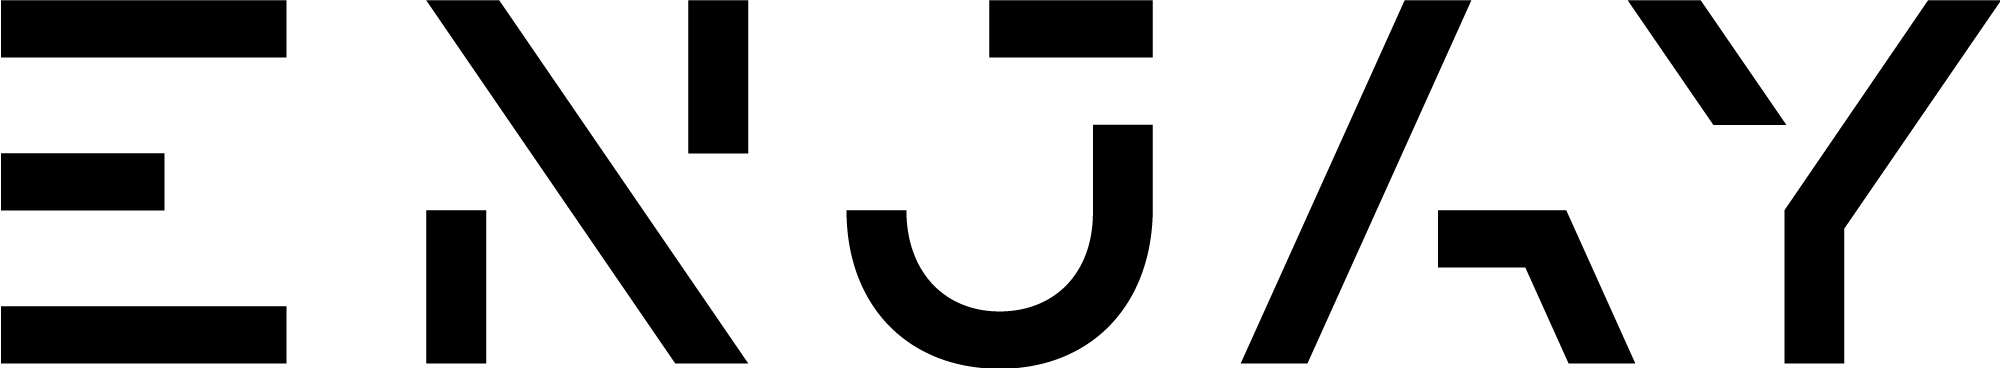 Enjay logo